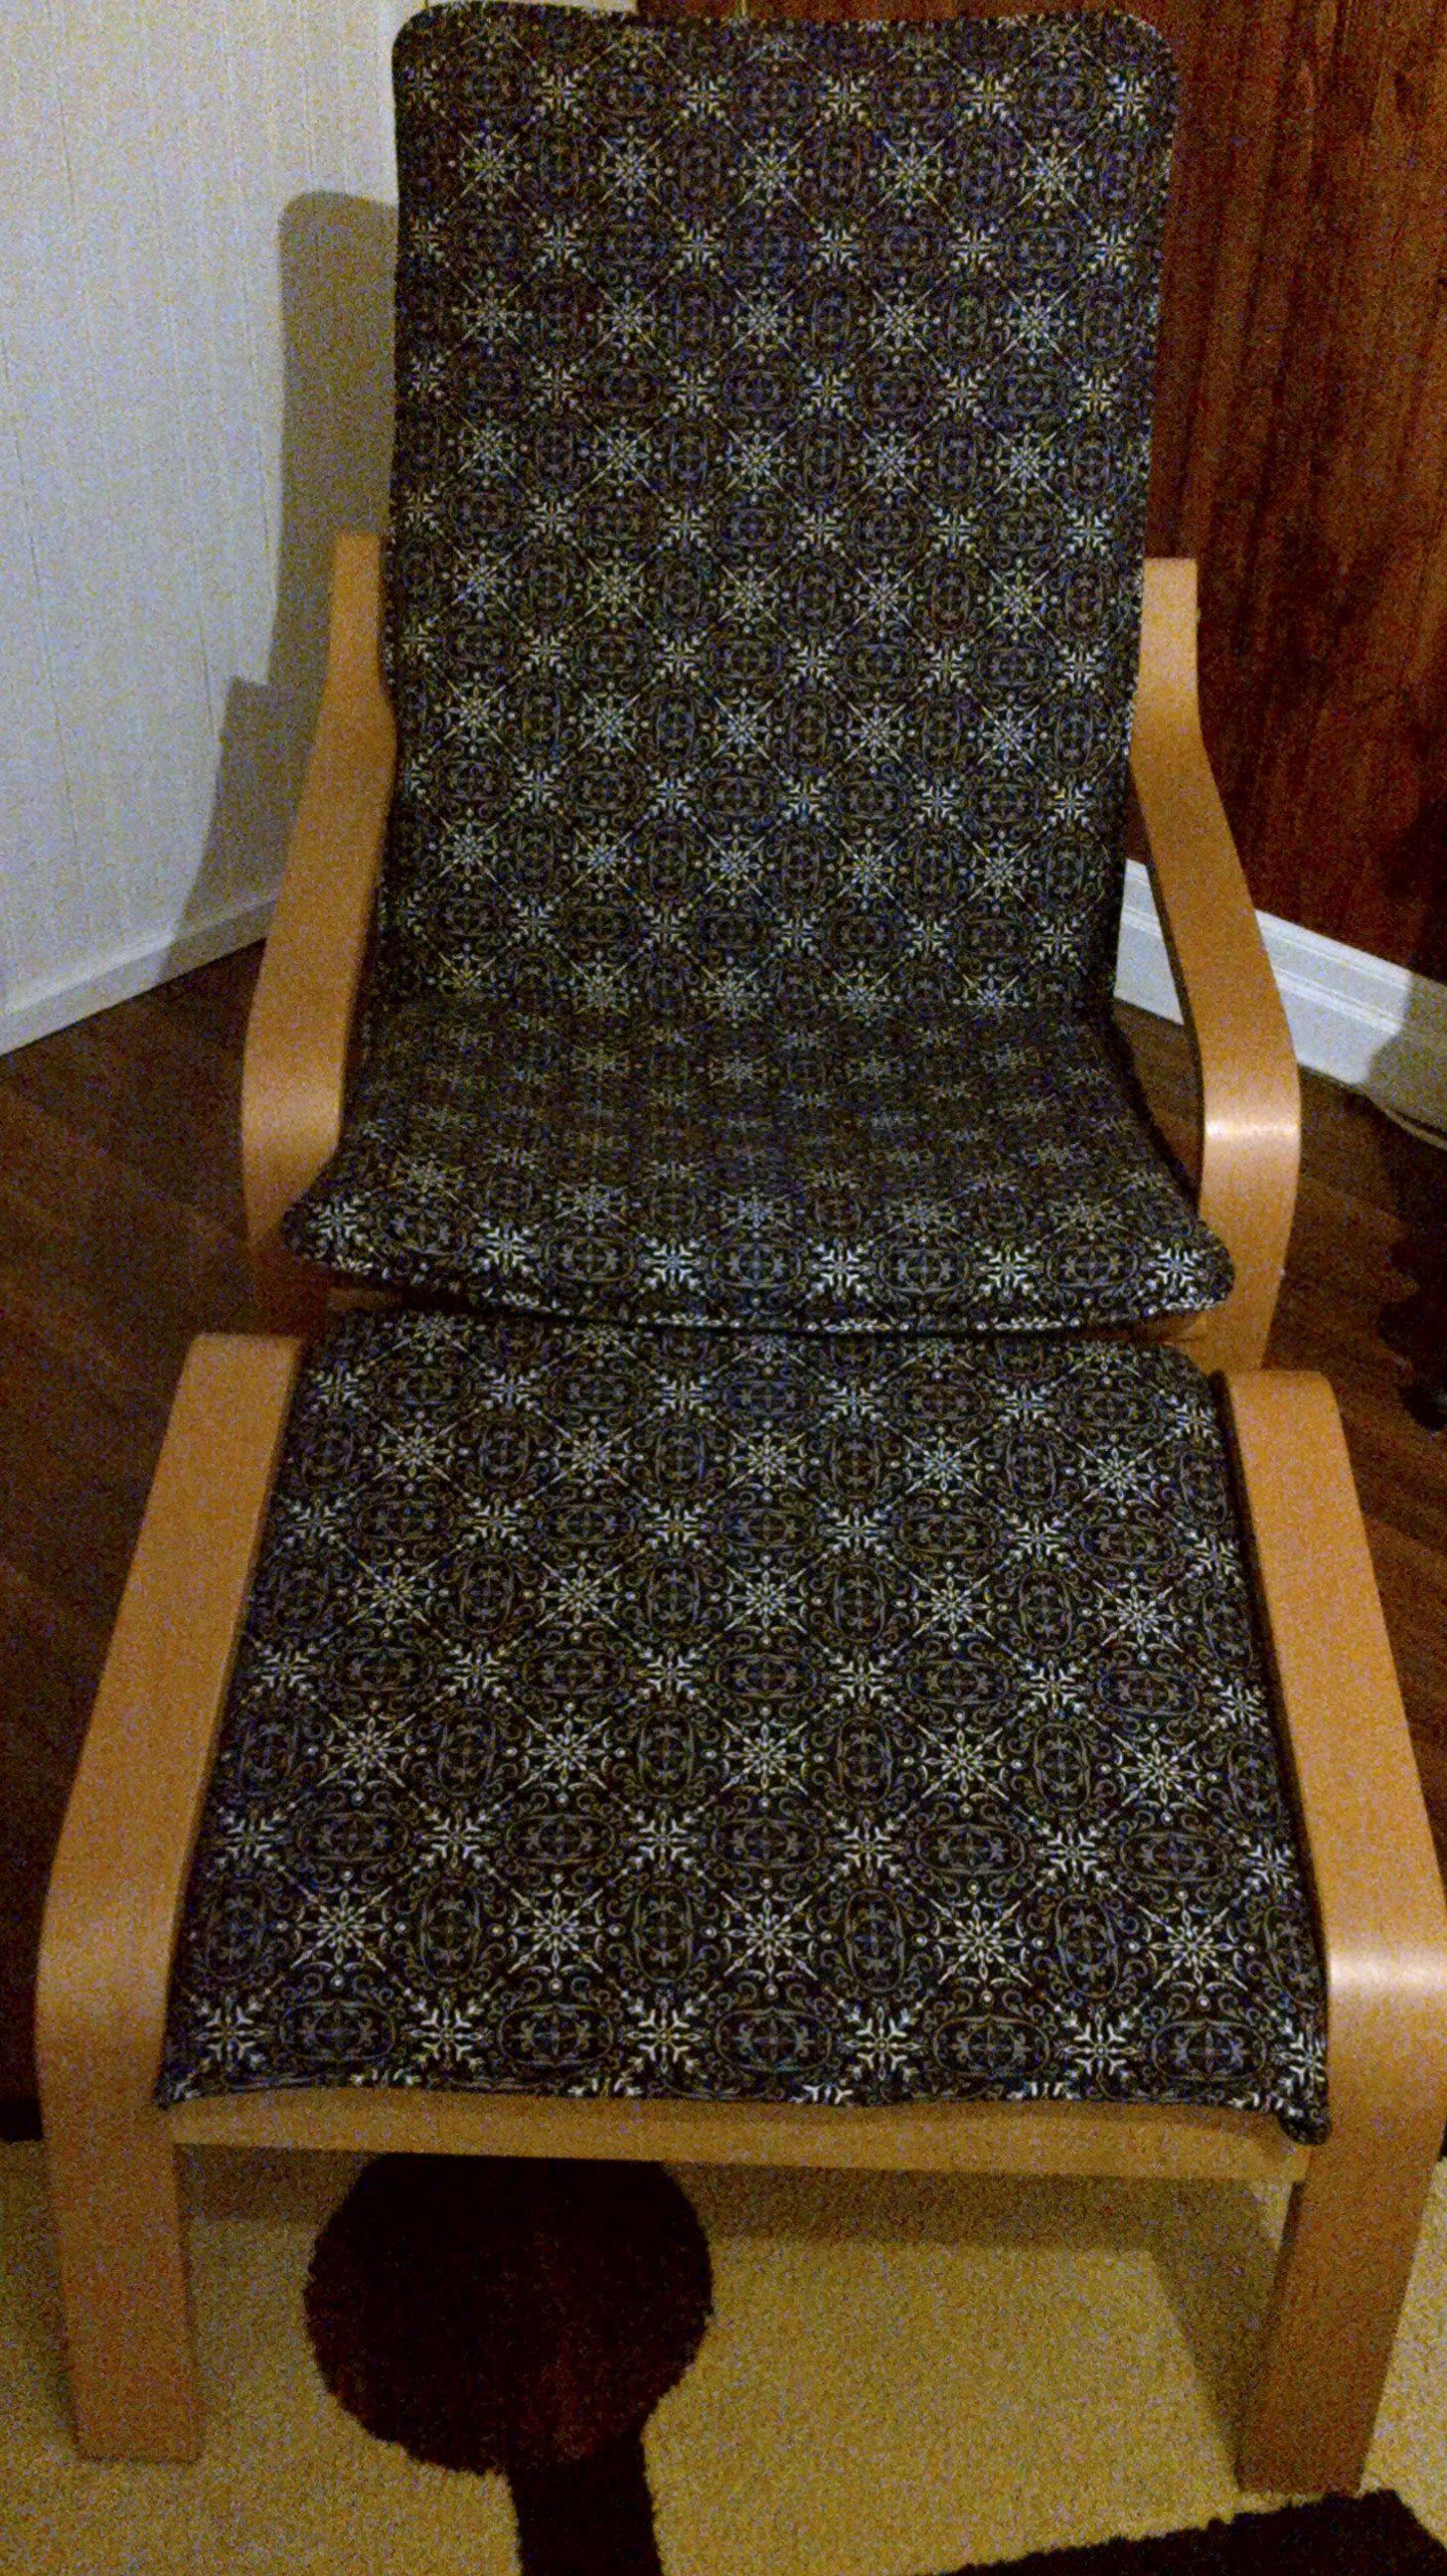 Super Easy Ikea Poang Chair Cover Diy Diy Chair Covers Ikea Poang Chair Ikea Chair Cover